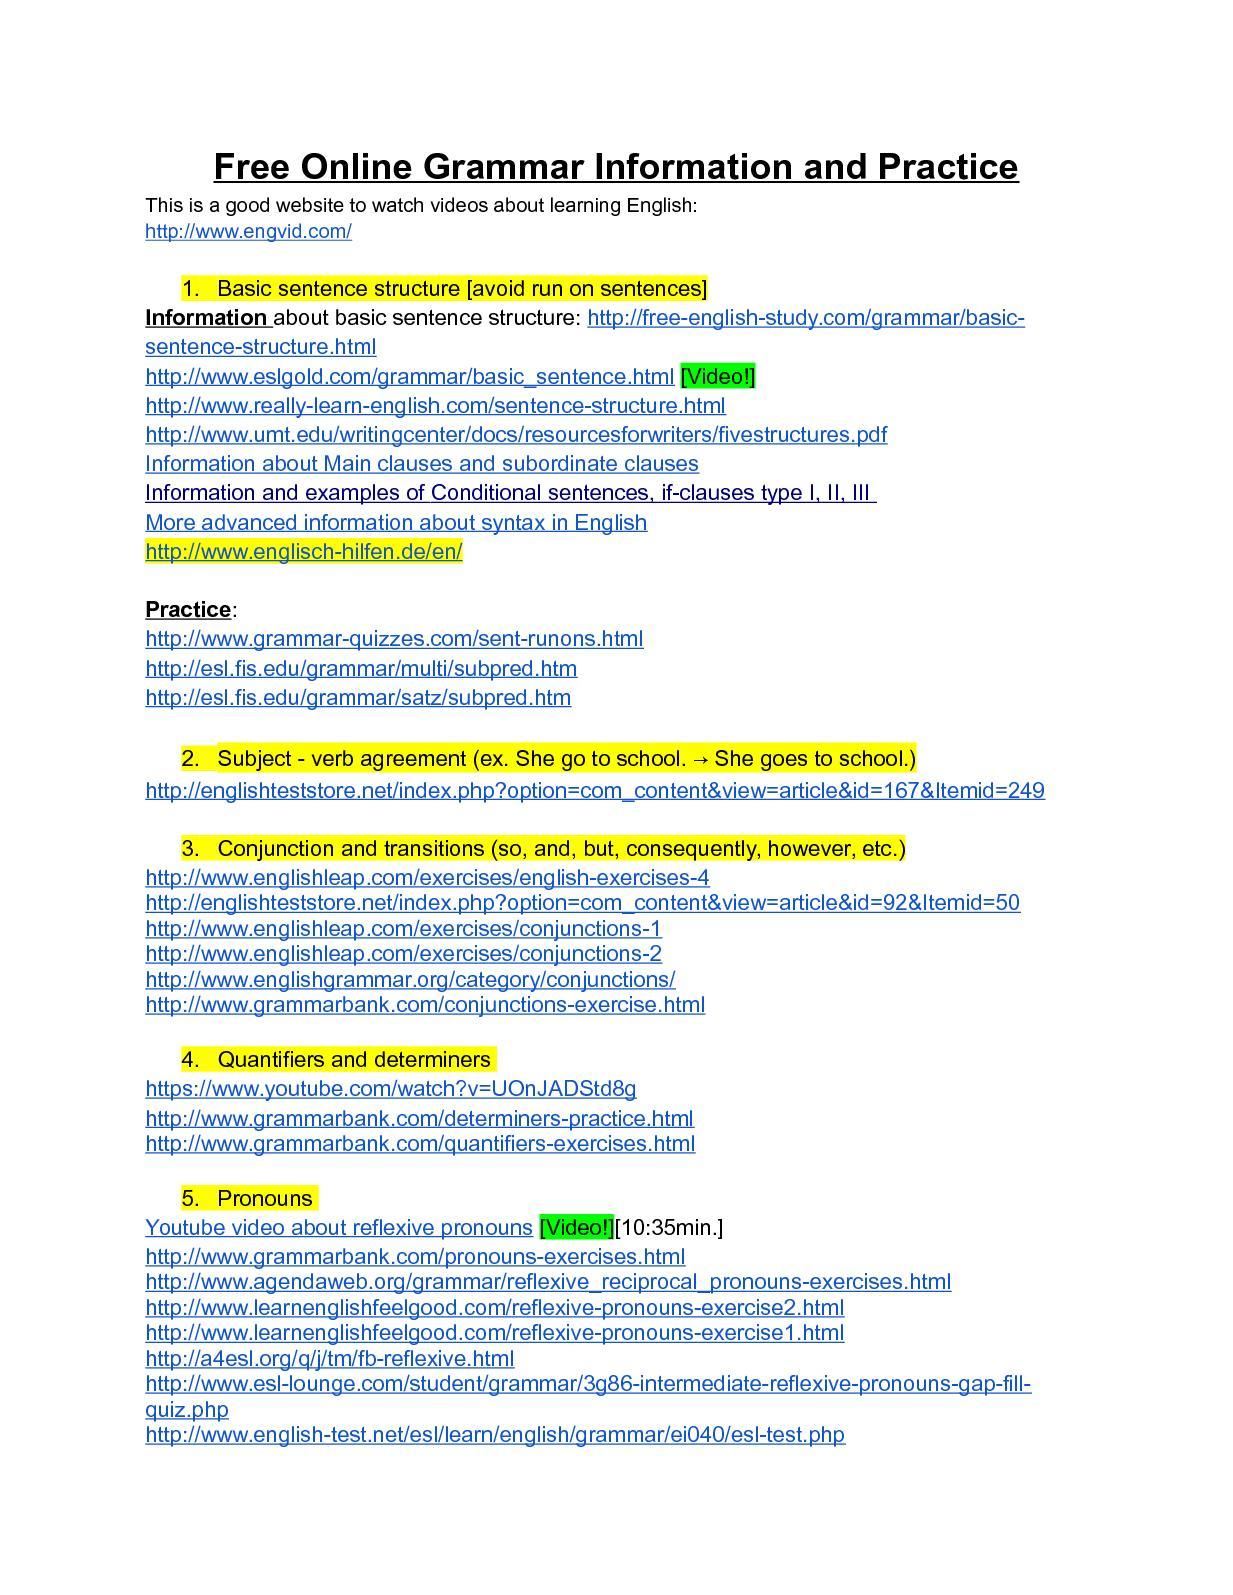 Calaméo - Free Online Grammar Information And Practice Publicar